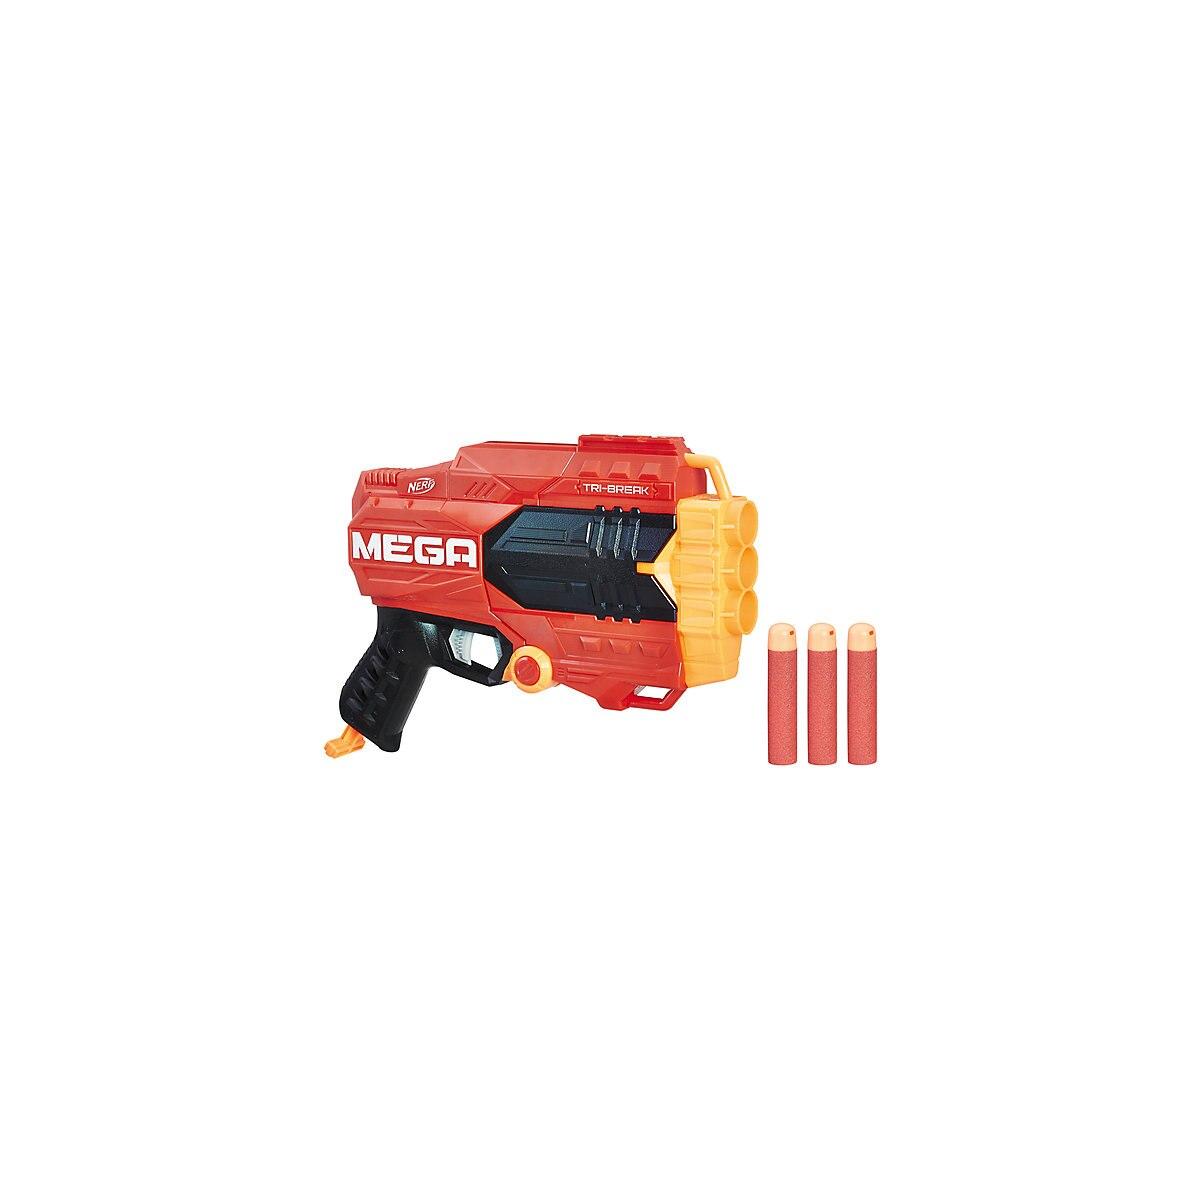 NERF Toy Guns 7922801 gun weapon toys games pneumatic blaster boy orbiz revolver Outdoor Fun Sports MTpromo